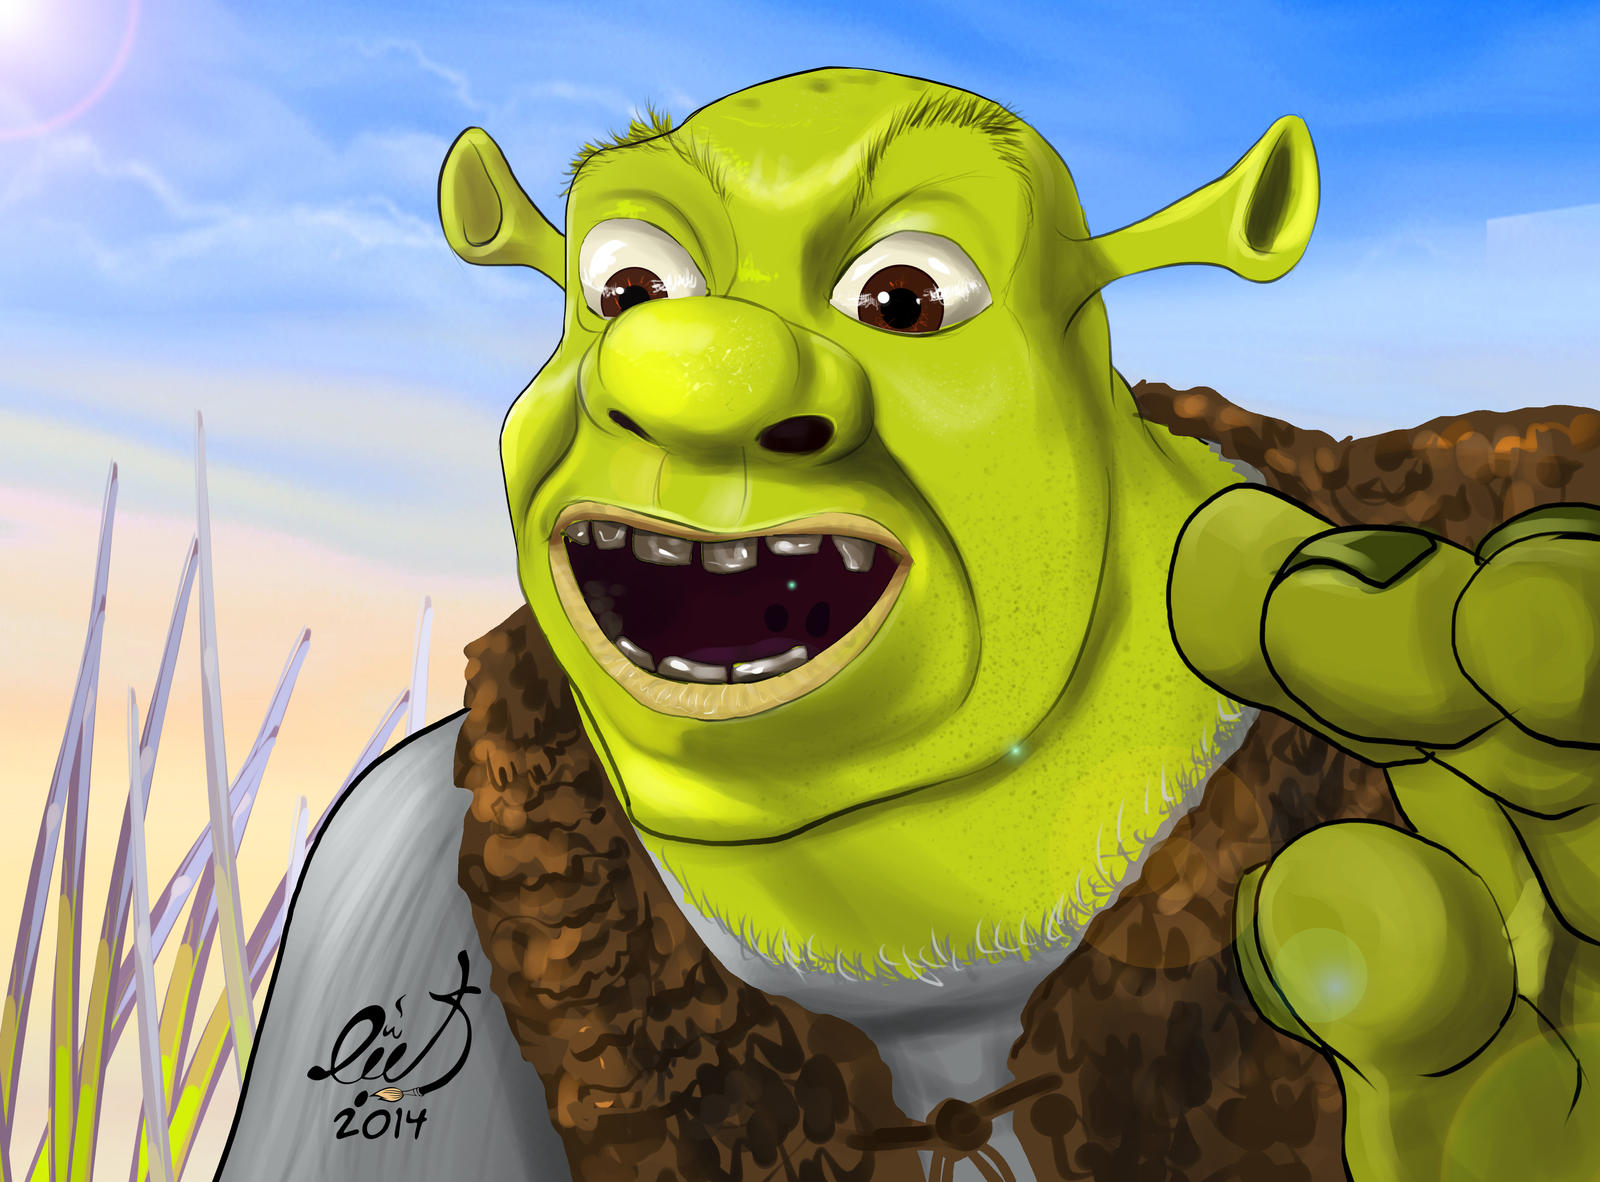 Shrek heitai hardcore movie